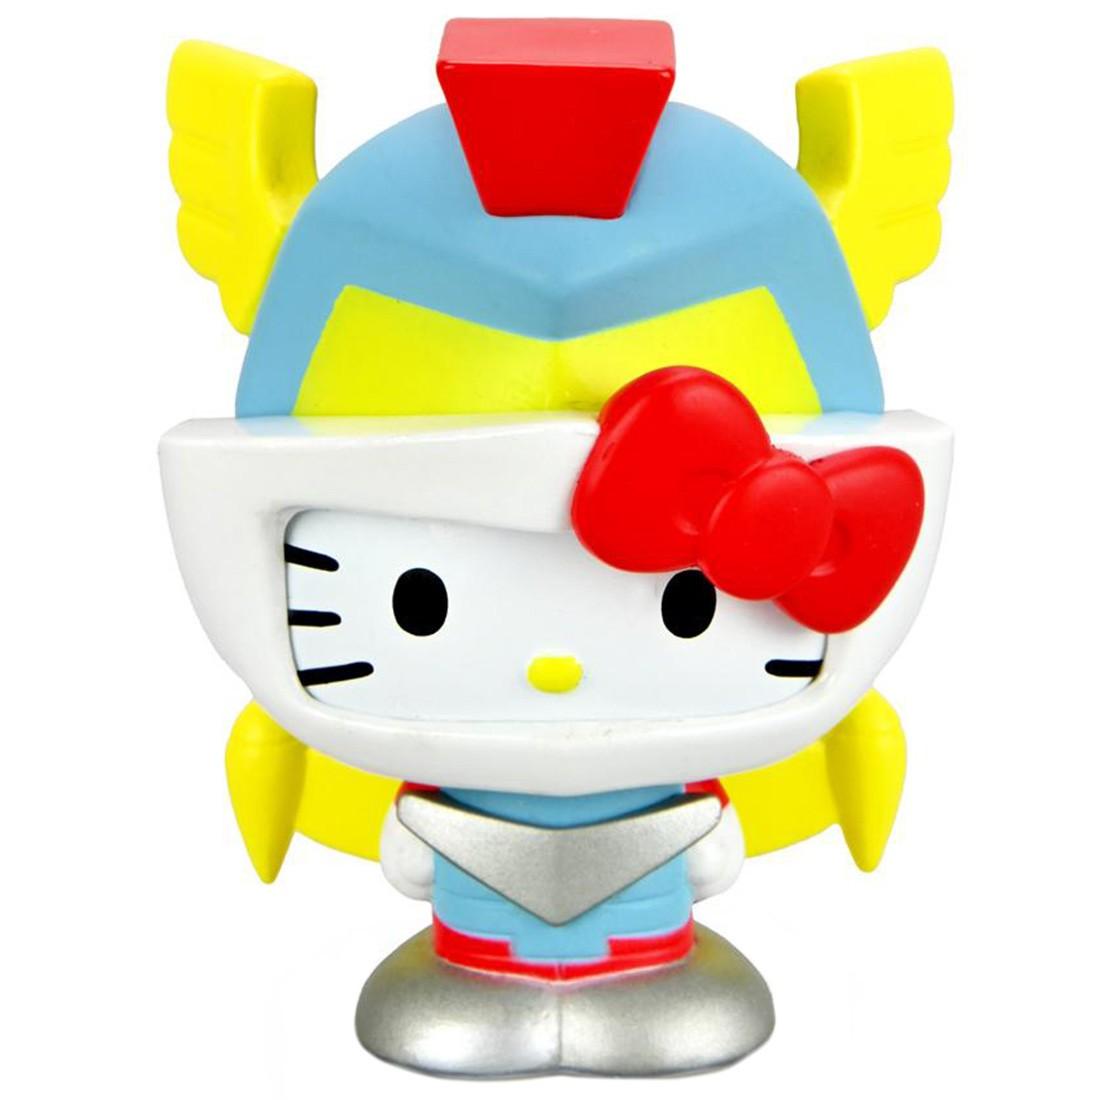 Kidrobot Hello Kitty Kaiju 3 Inch Mini Figure Series - Mechazoar Prime (silver)